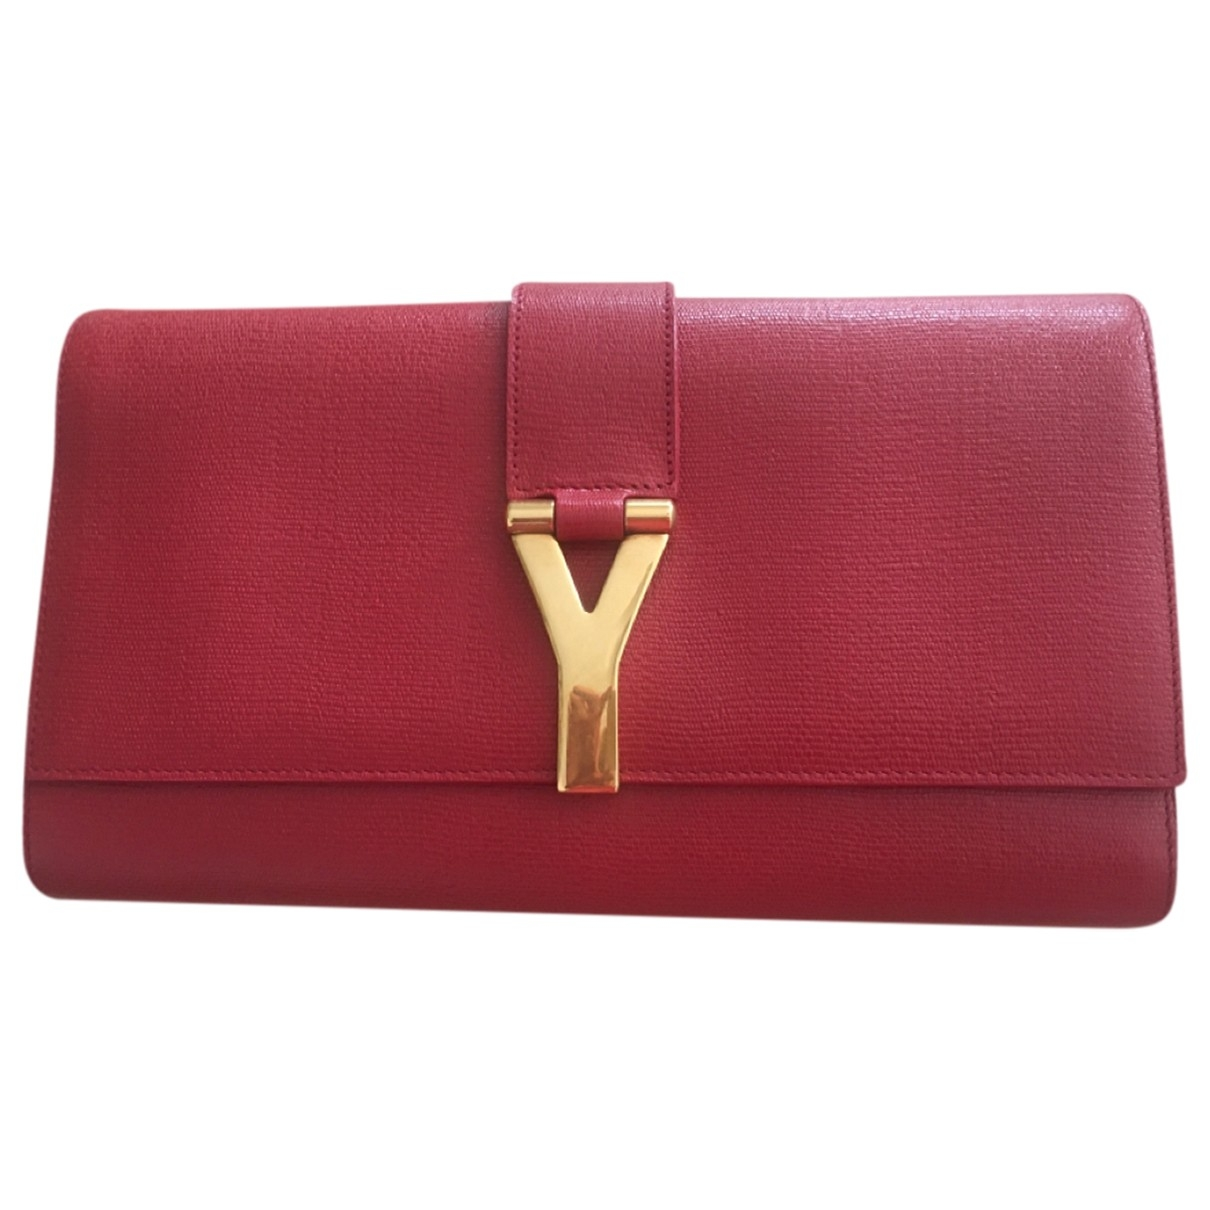 Yves Saint Laurent Chyc Clutch in  Rot Leder